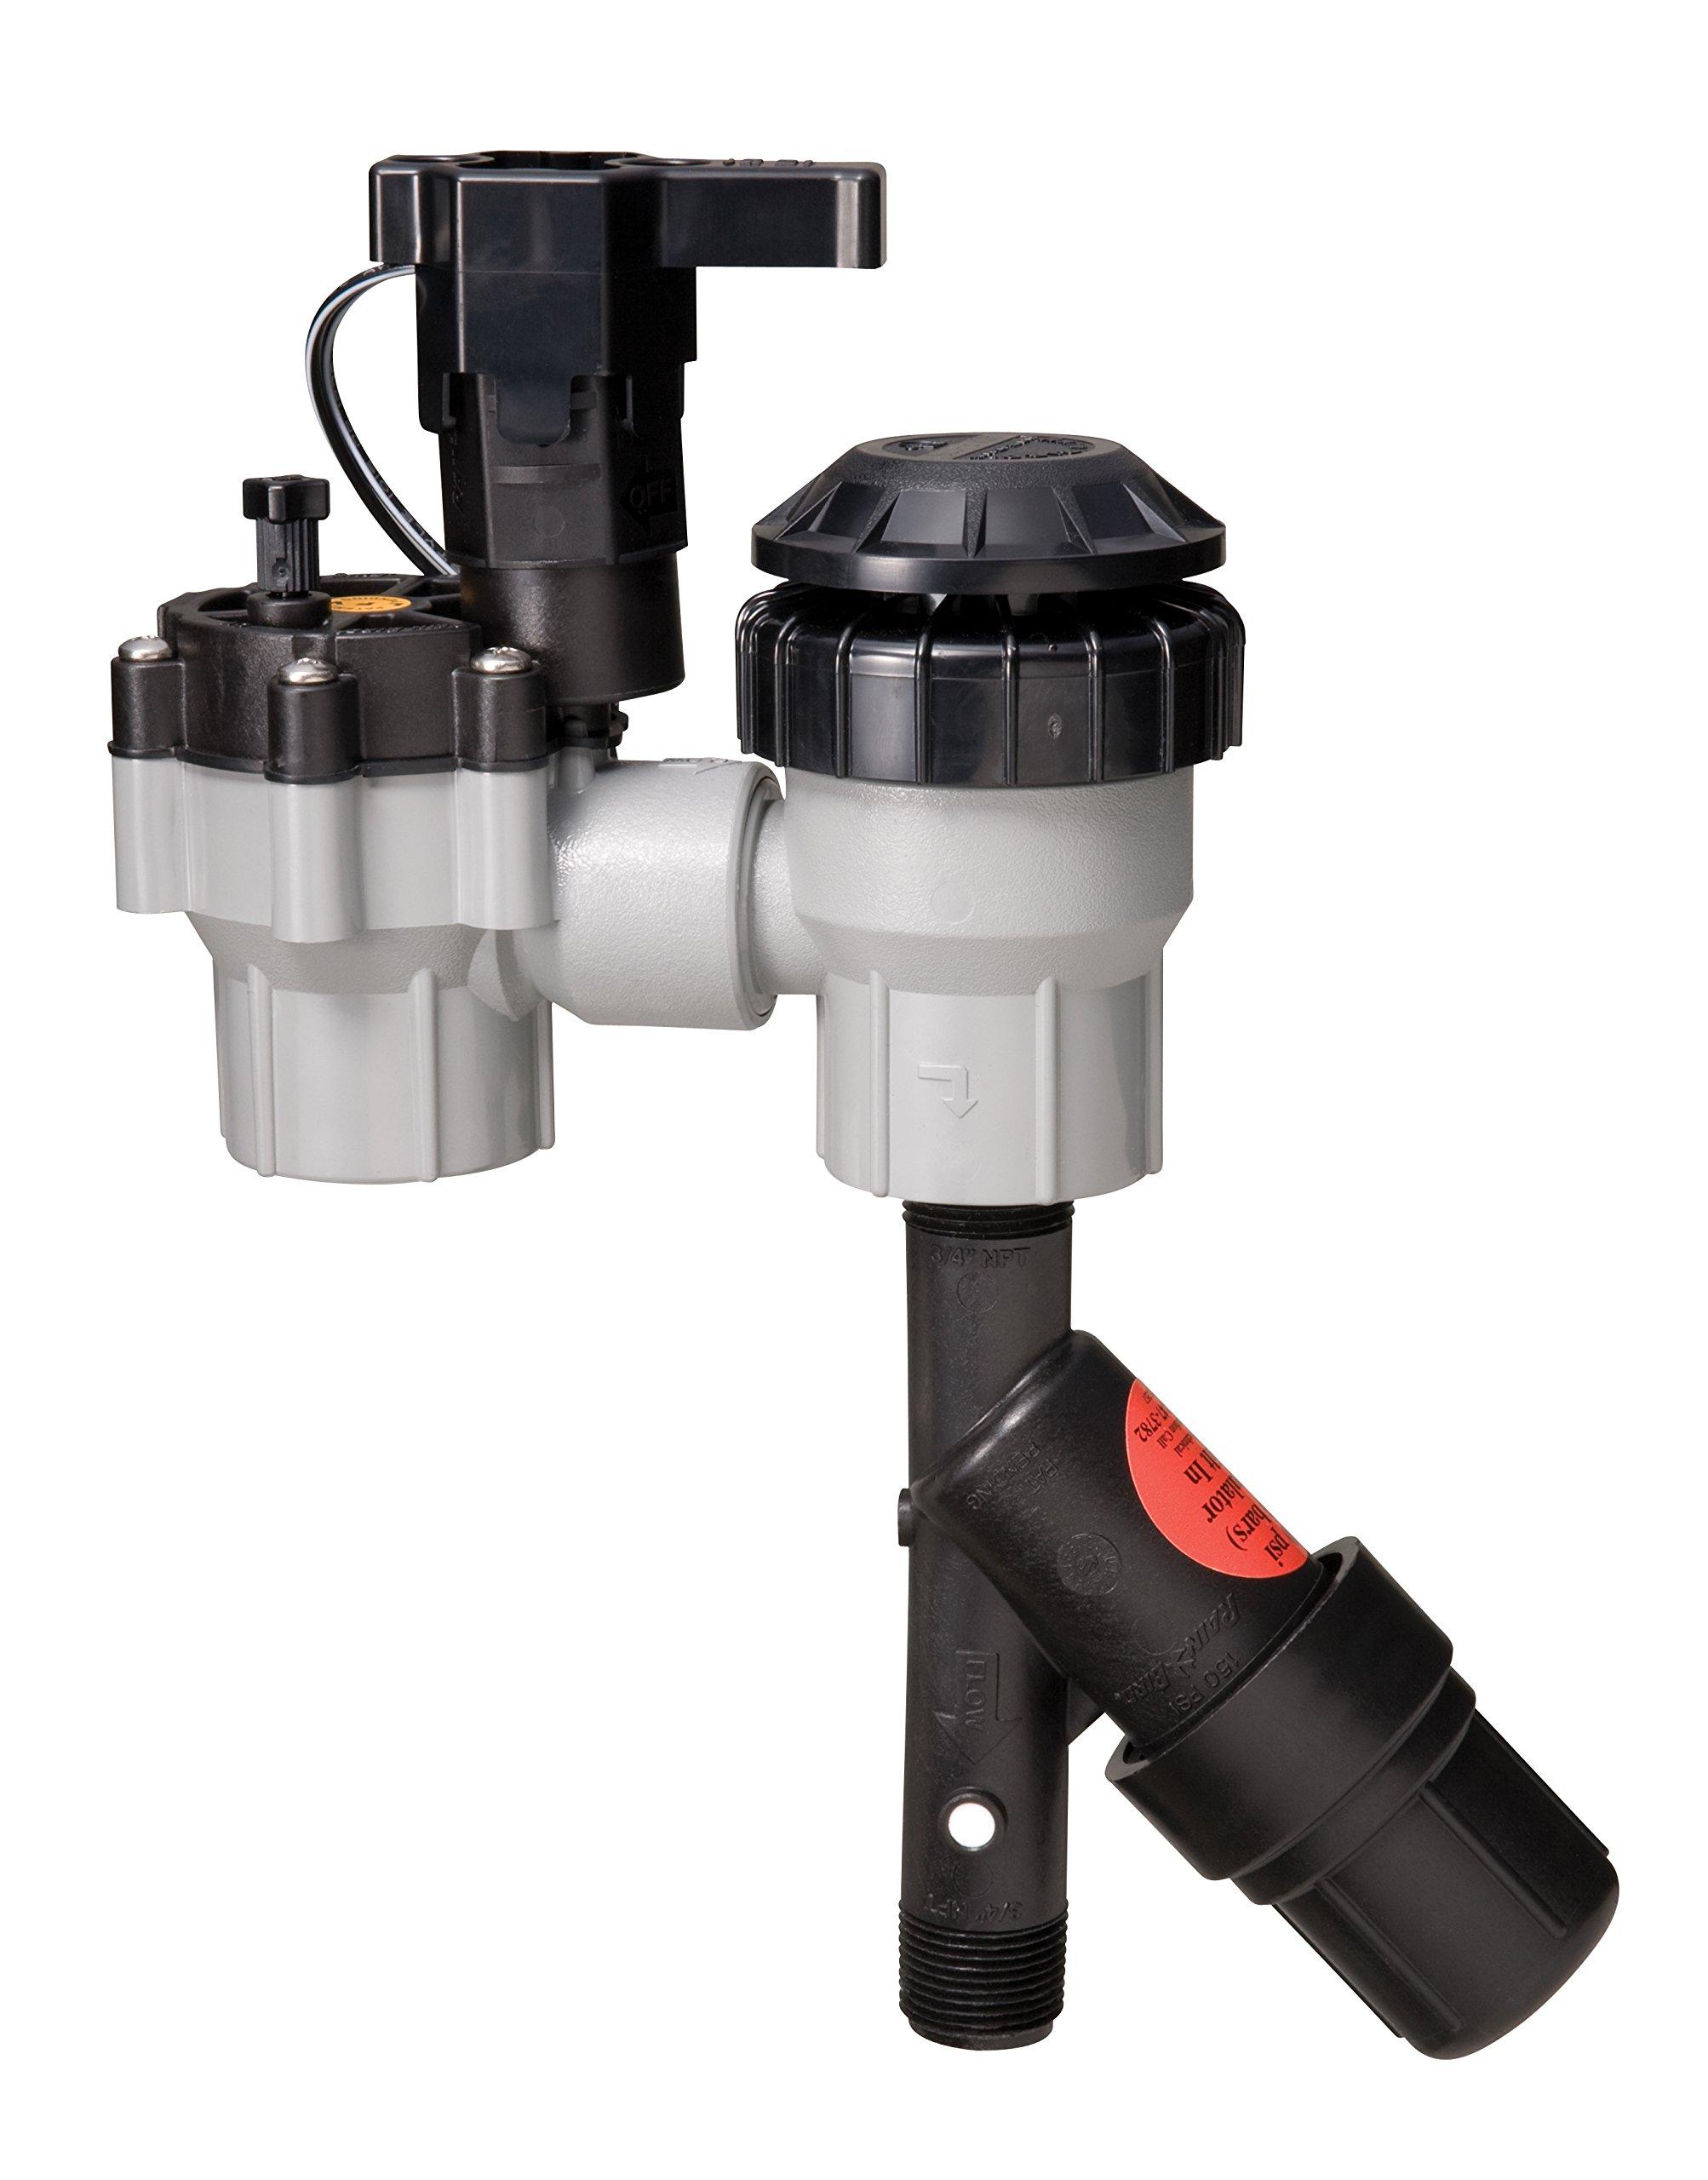 Rain Bird CPZ075FAS Drip Irrigation Anti-Siphon Control Valve Kit, 3/4'' Female x Female